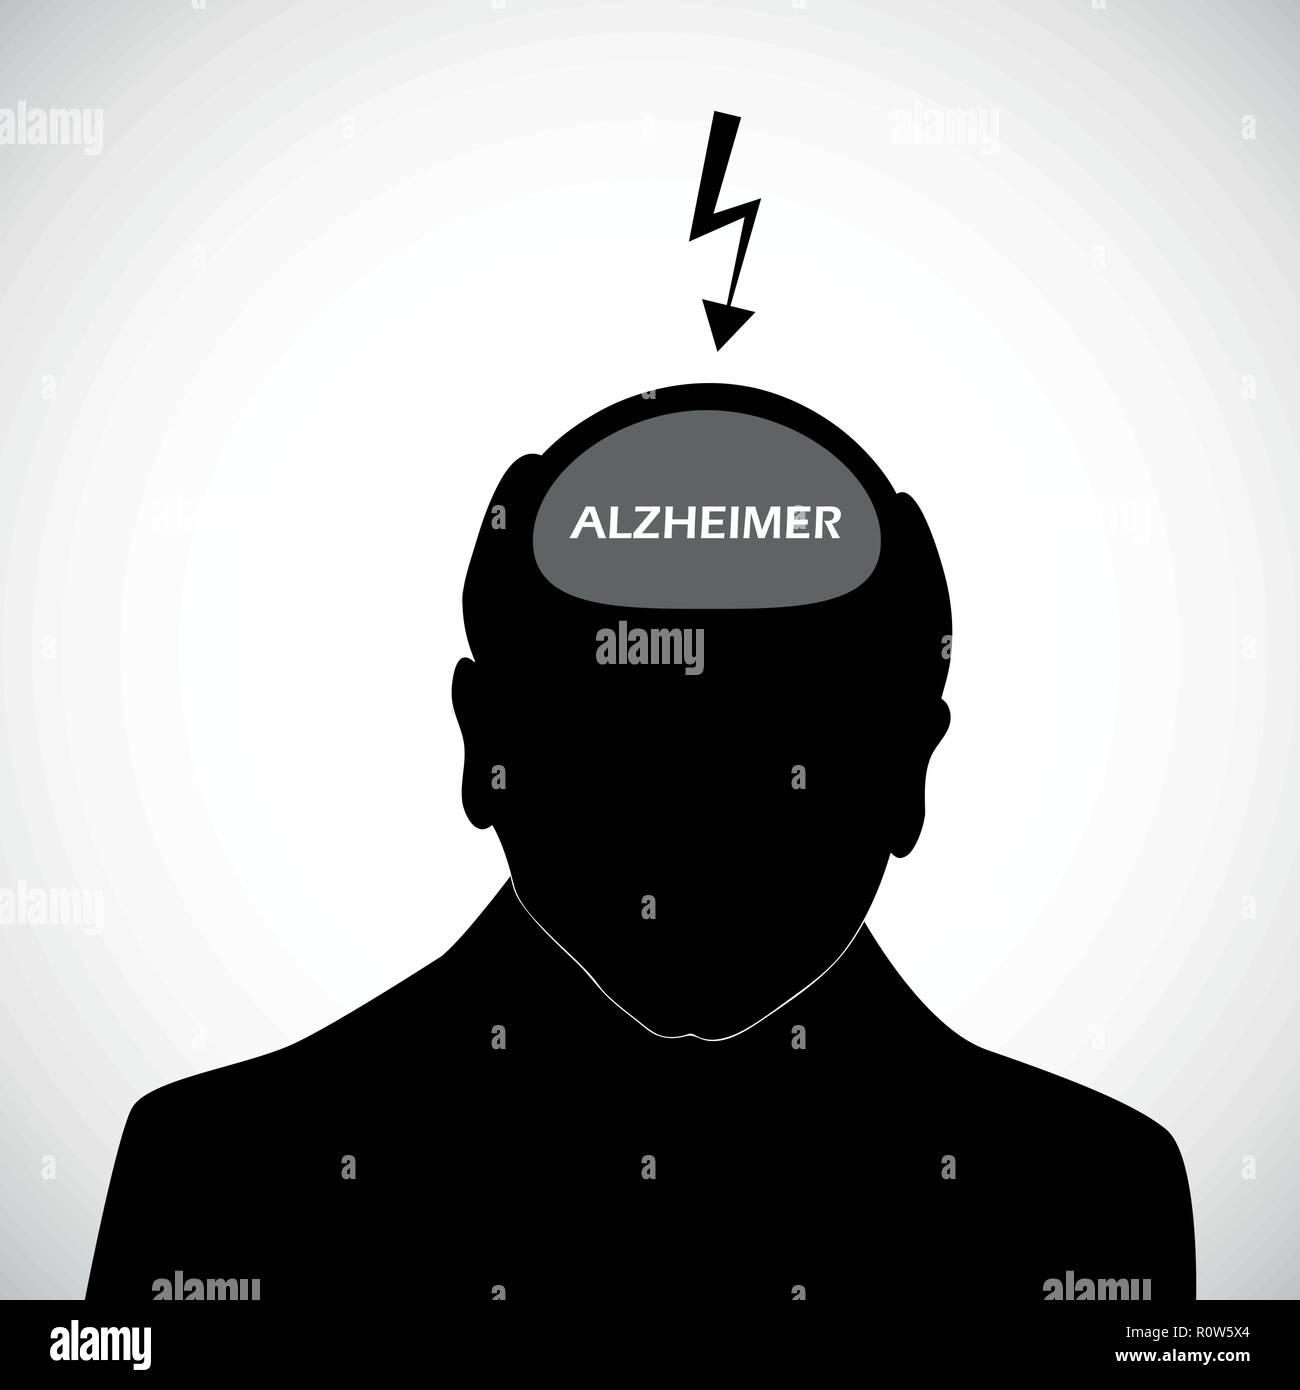 old man silhouette human head alzheimer vector illustration EPS10 - Stock Vector